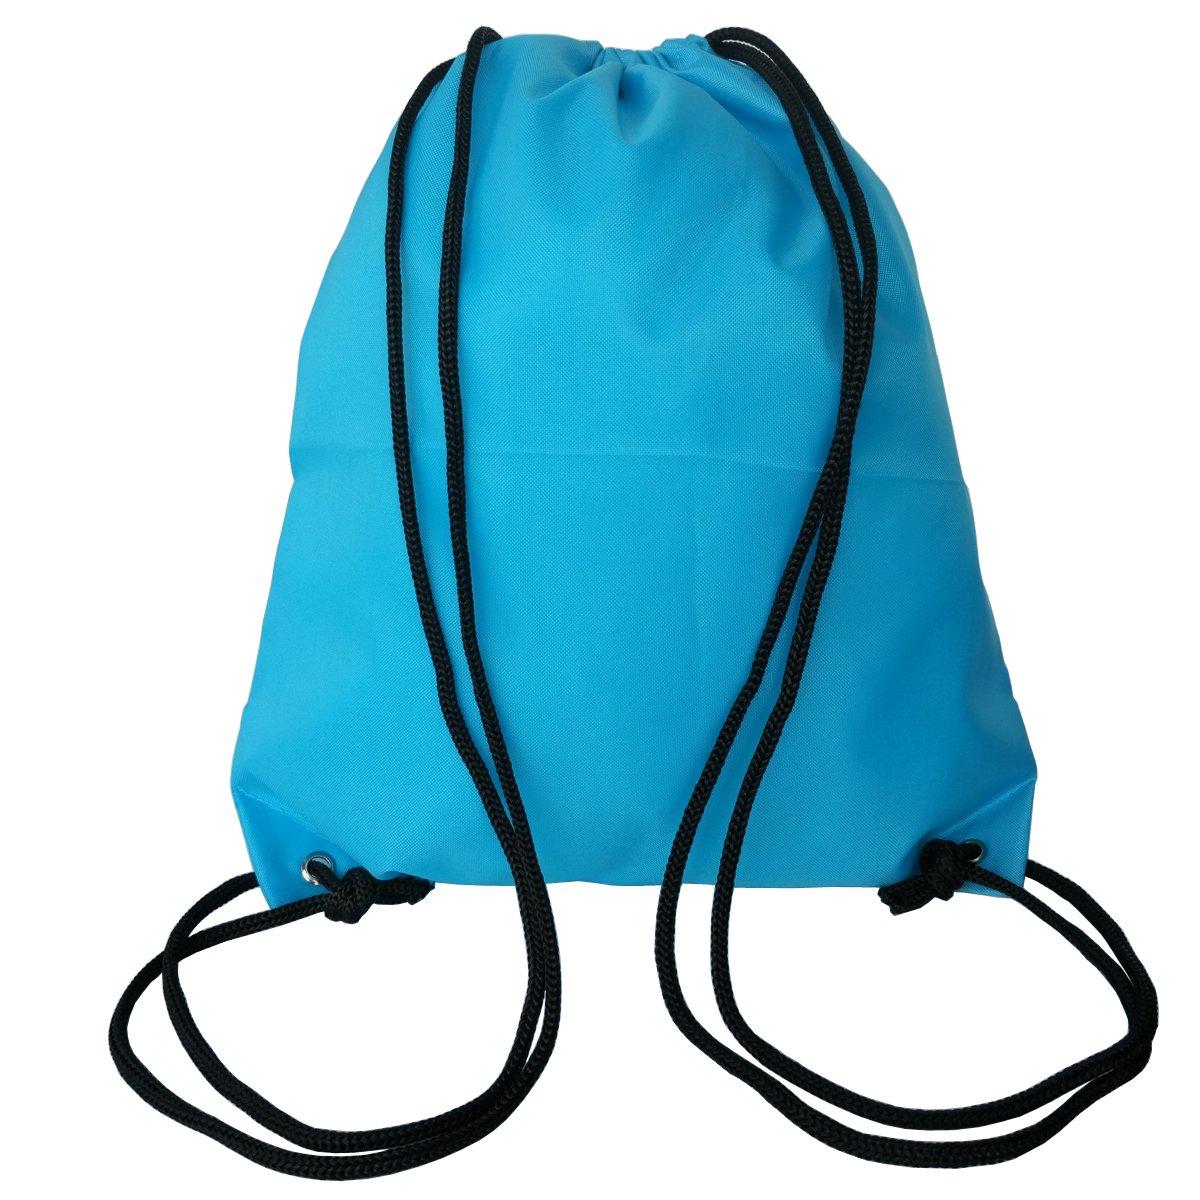 6 Pack Drawstring Backpack Bags 420D polyester fabric Folding Shoulder Cinch Bag by Topspeeder (Image #4)